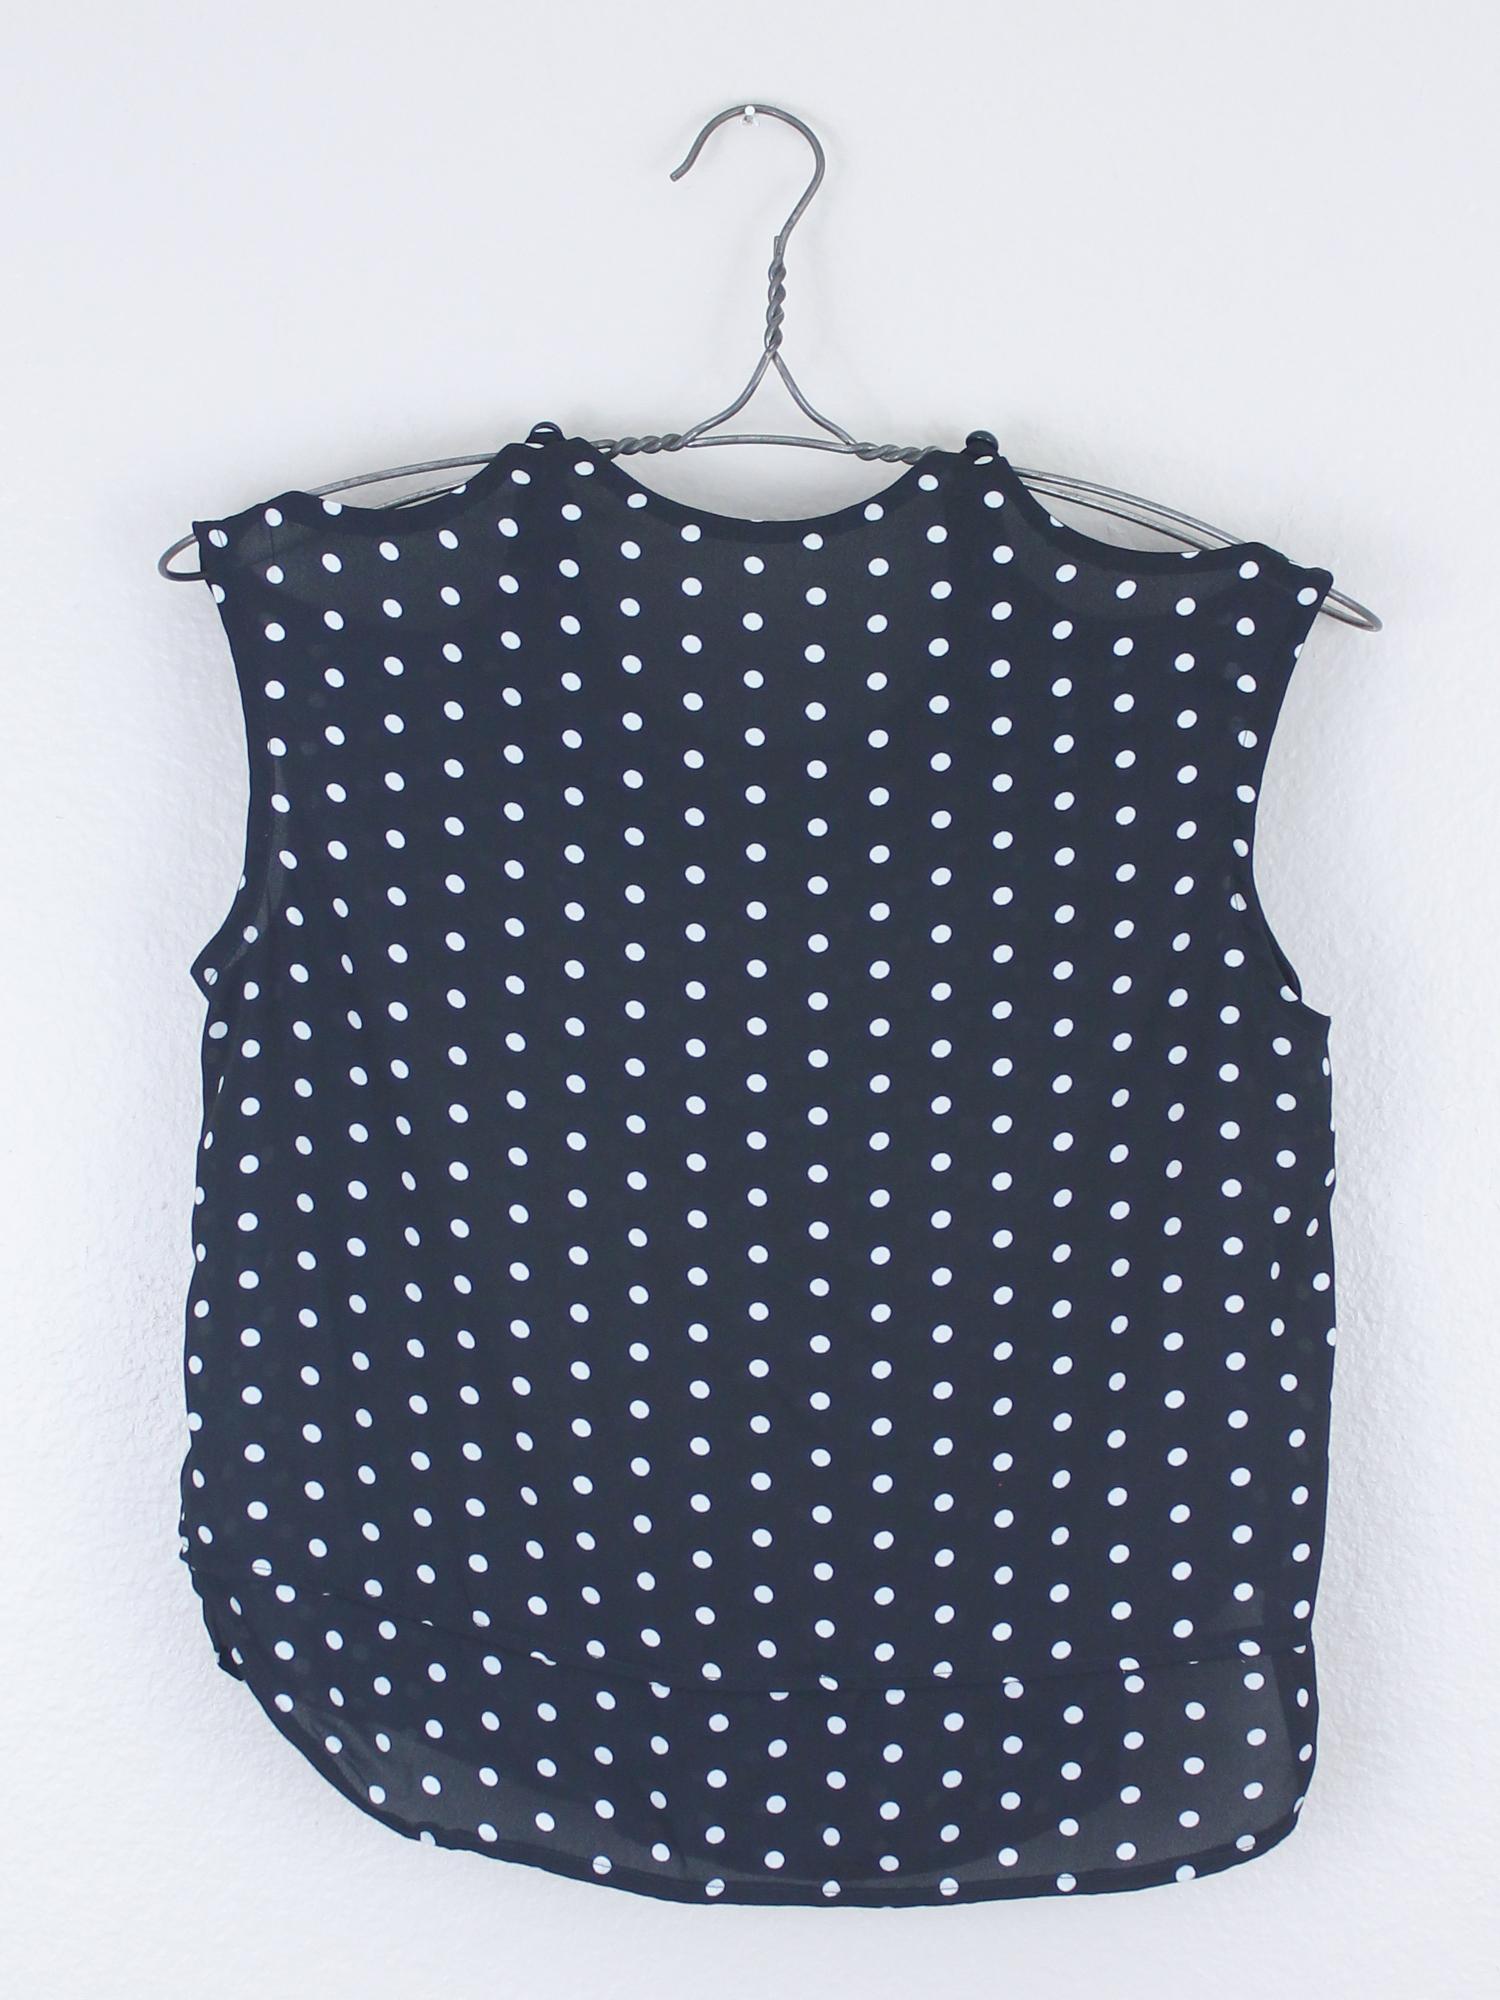 DIY Polka Dot Peplum Top – Sew DIY